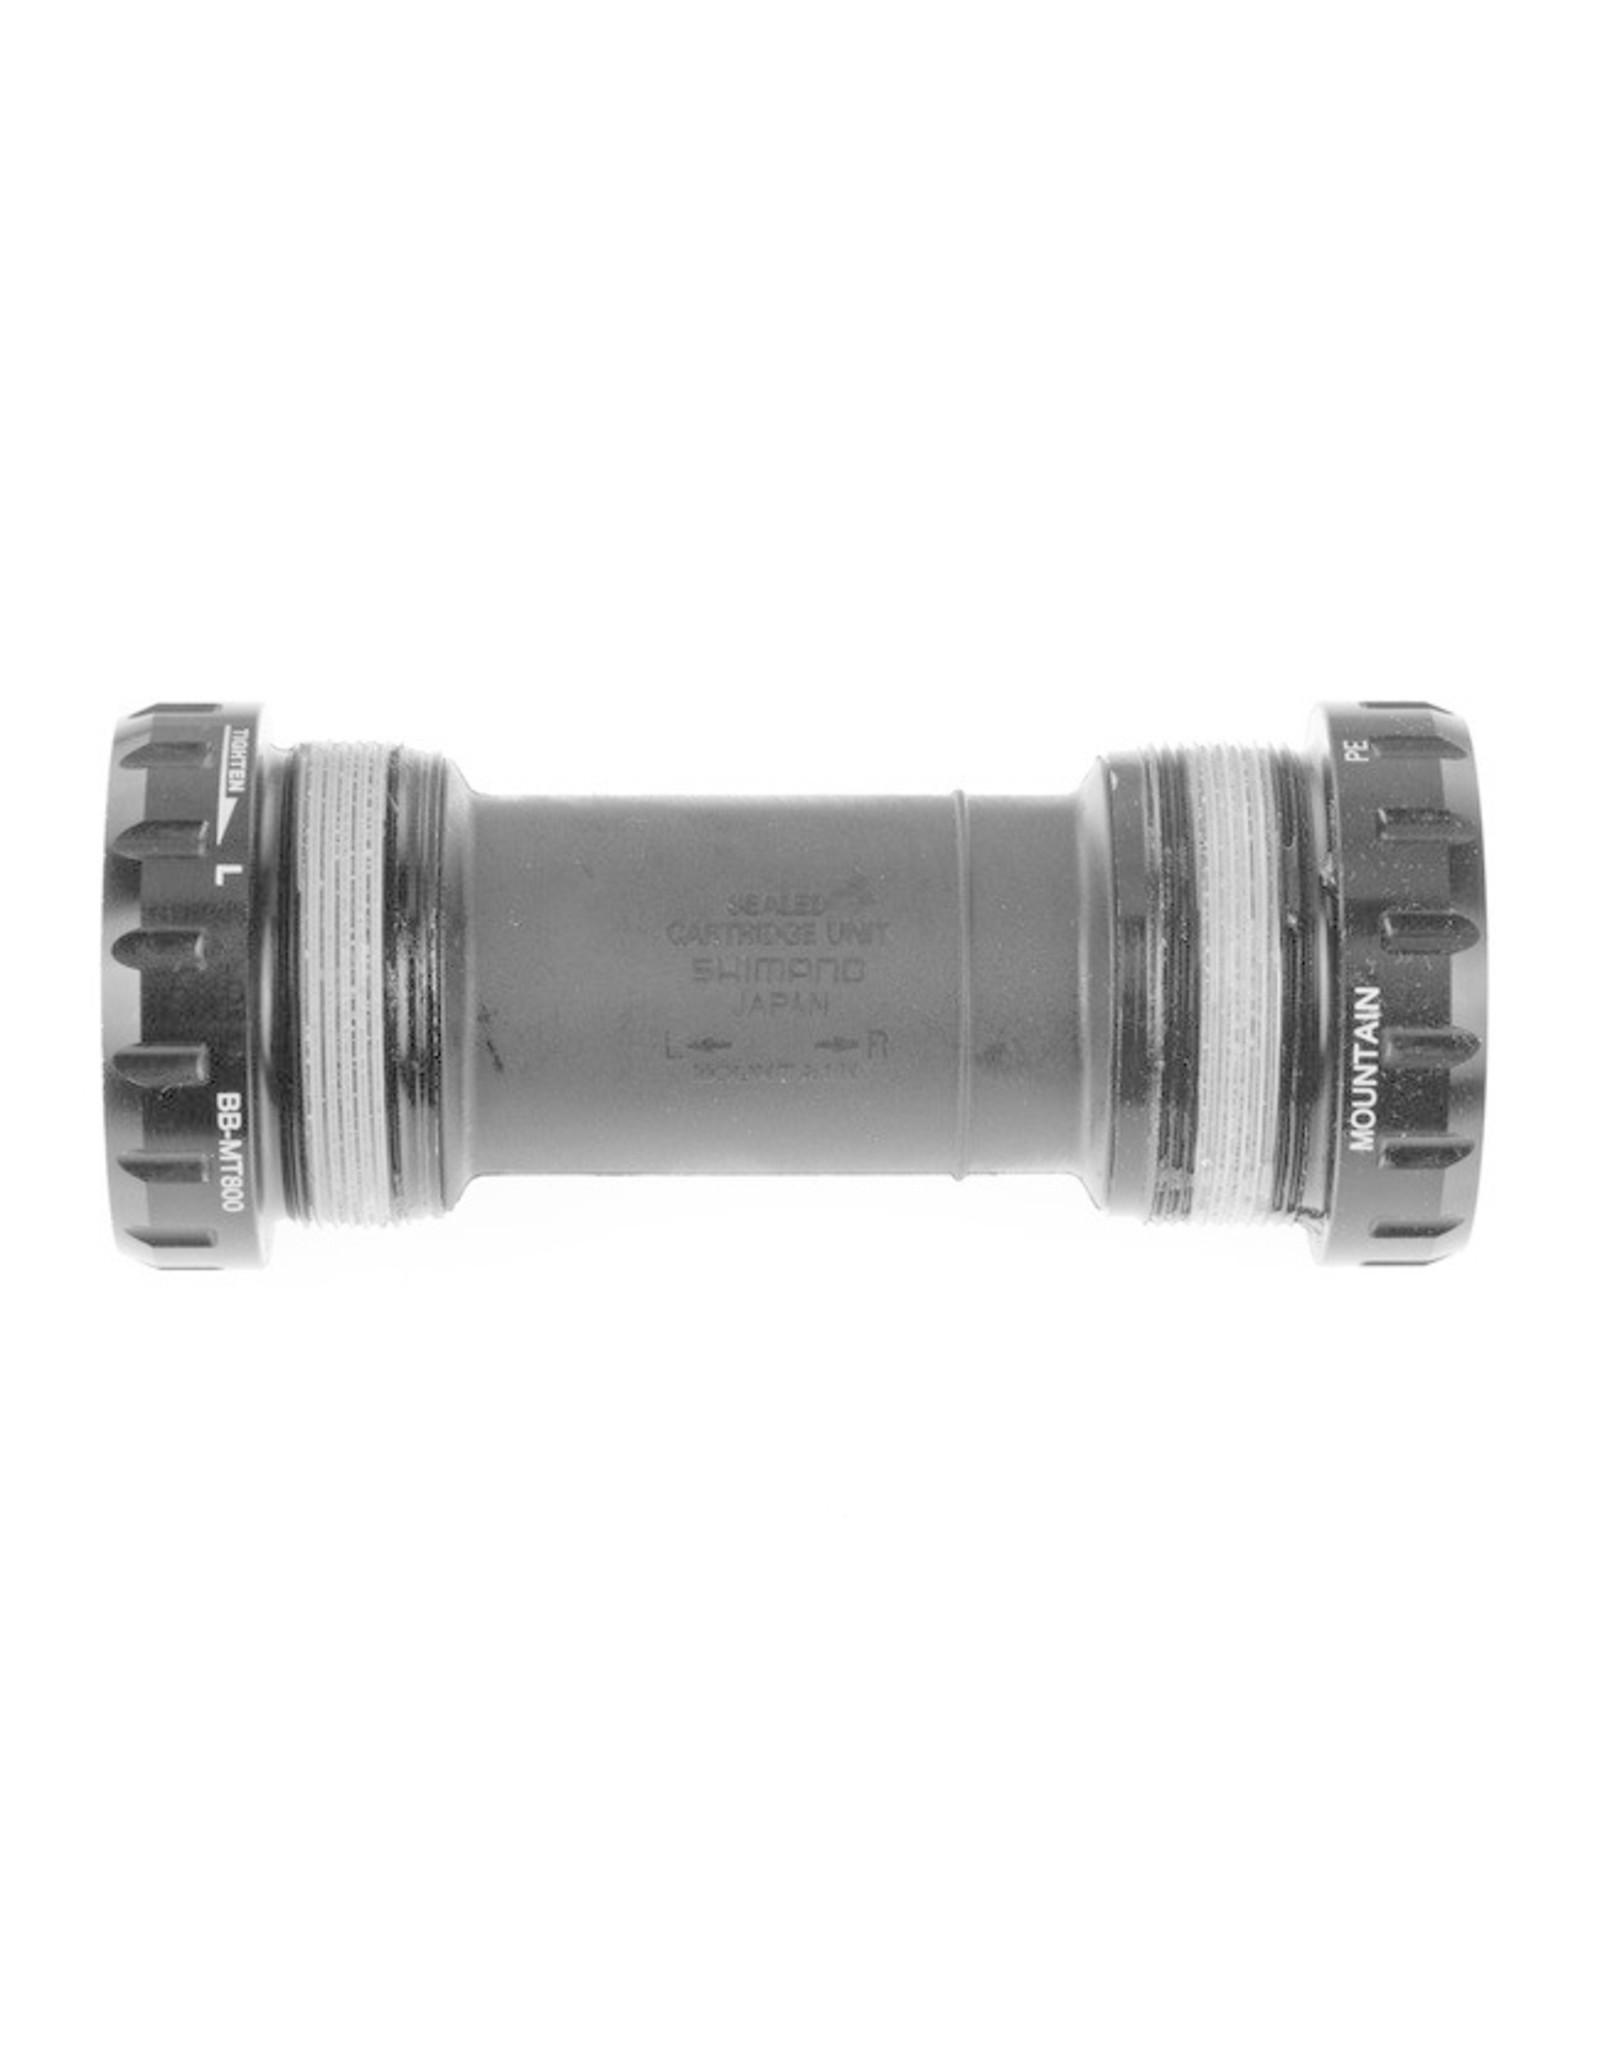 Shimano Bottom bracket Shim BSA MT800B XT 68/73mm FC25 (MTB)